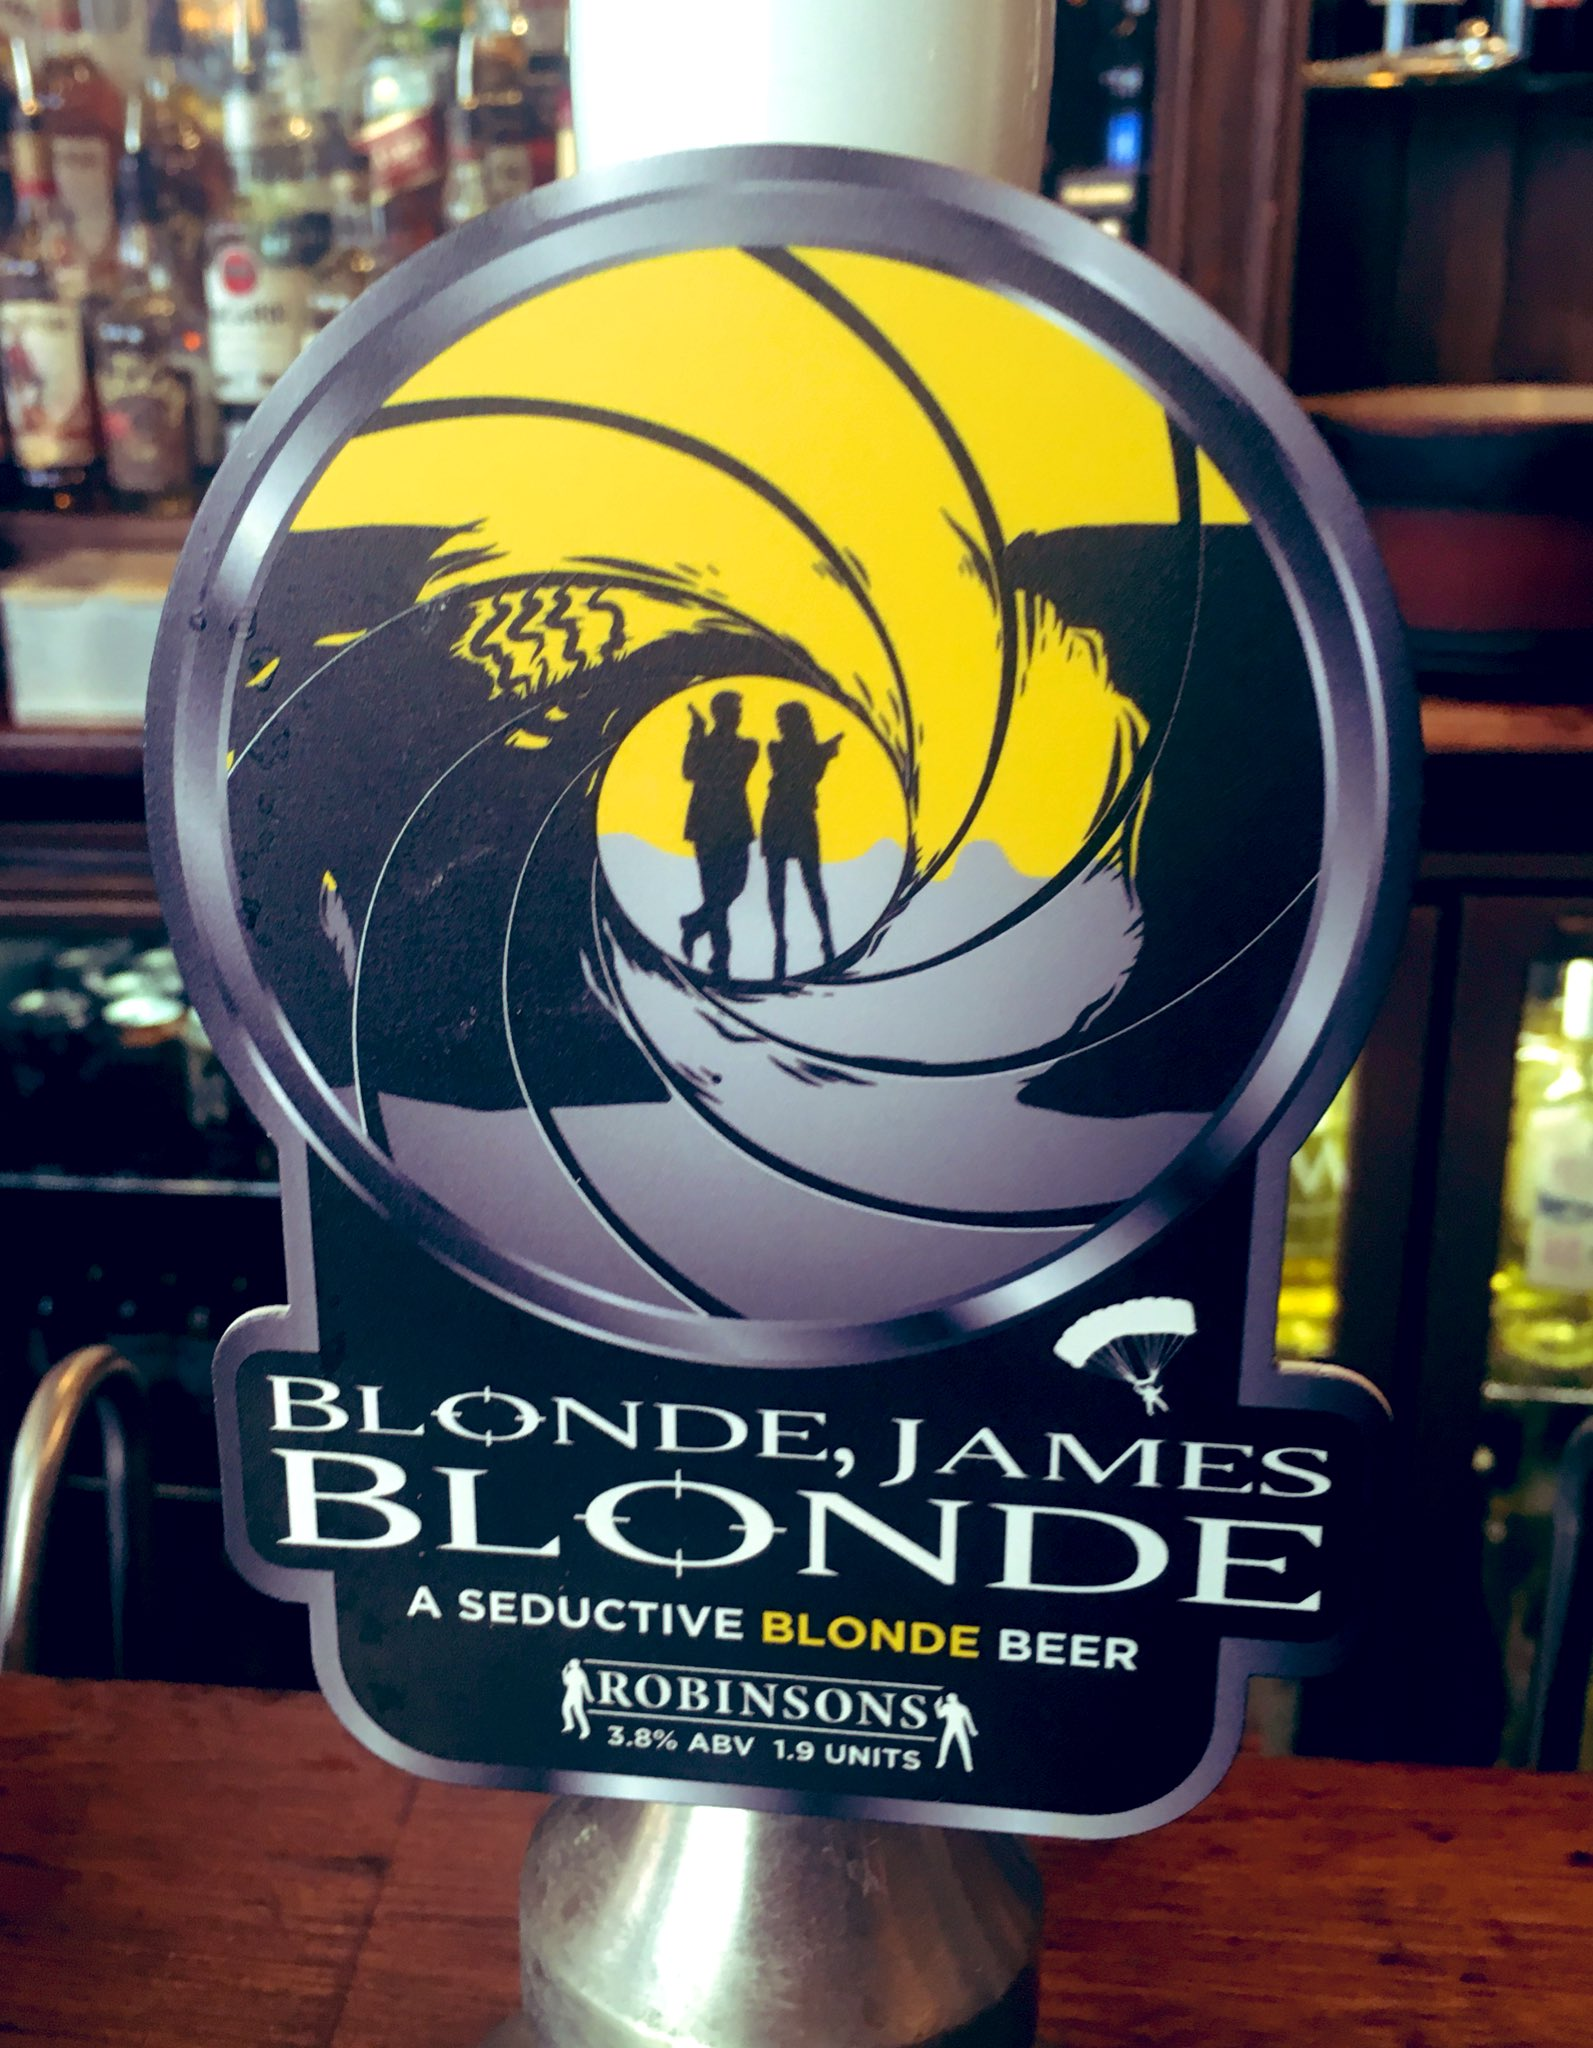 146: James Blonde